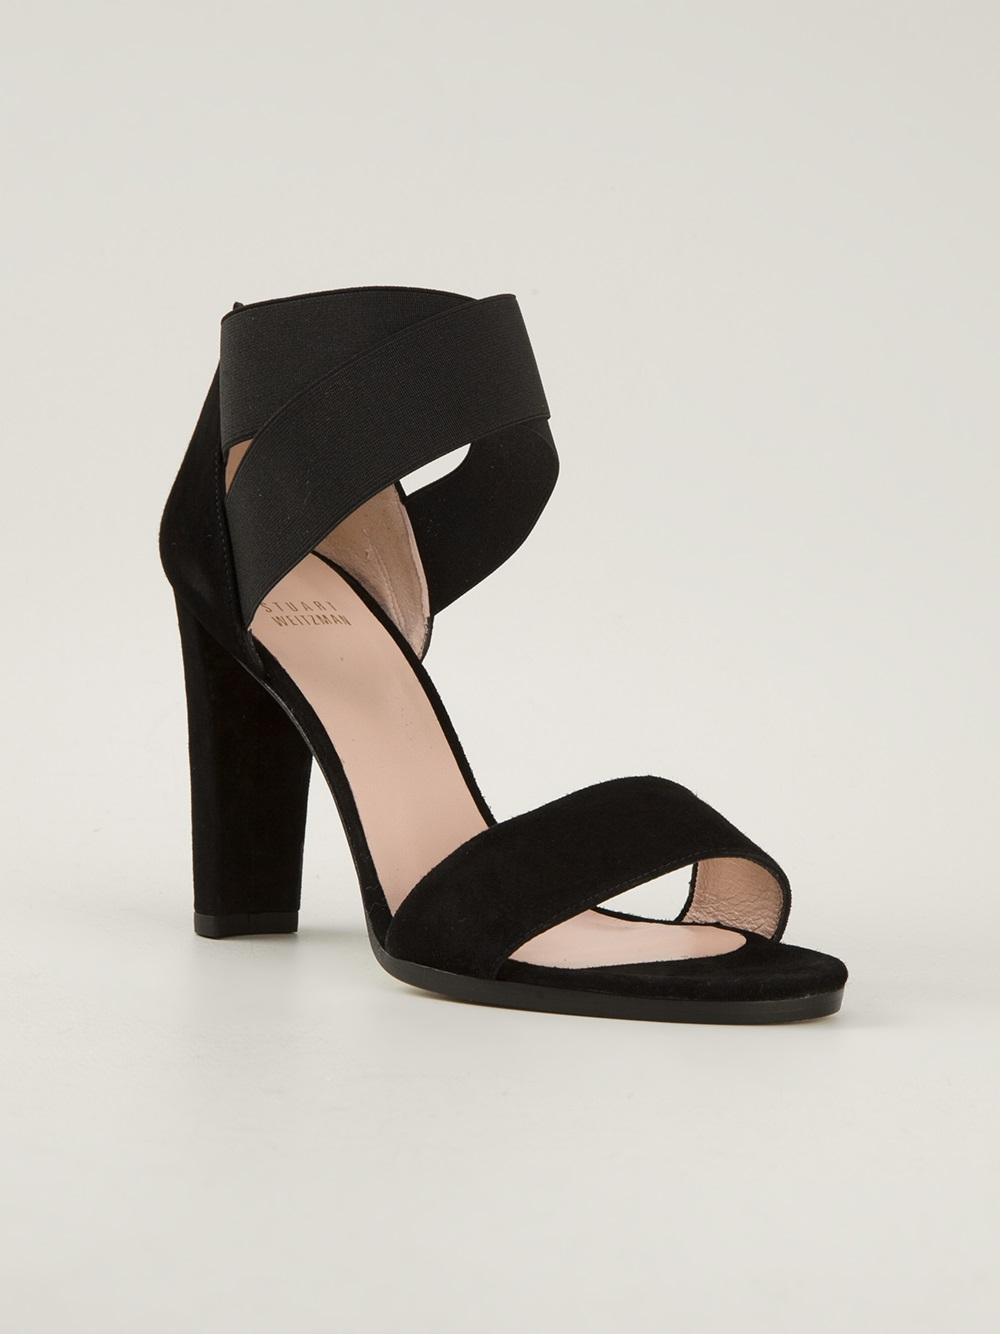 stuart-weitzman-black-chunky-heel-sandals-product-1-17461081-1-825900046-normal.jpeg